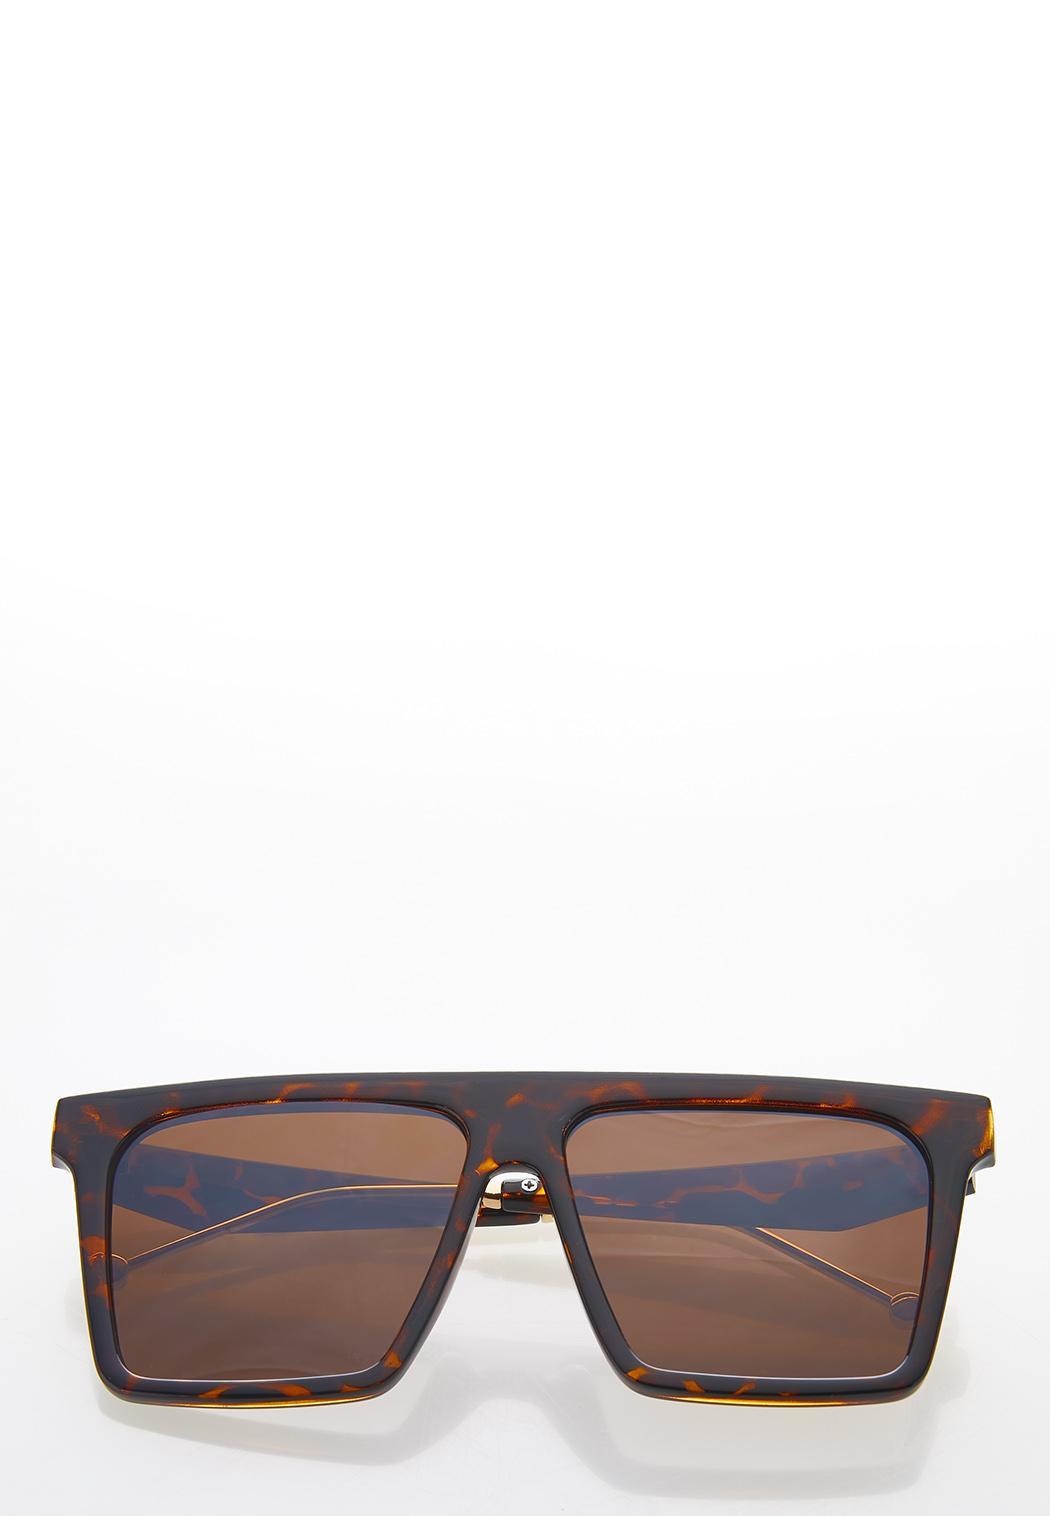 Chic Square Sunglasses